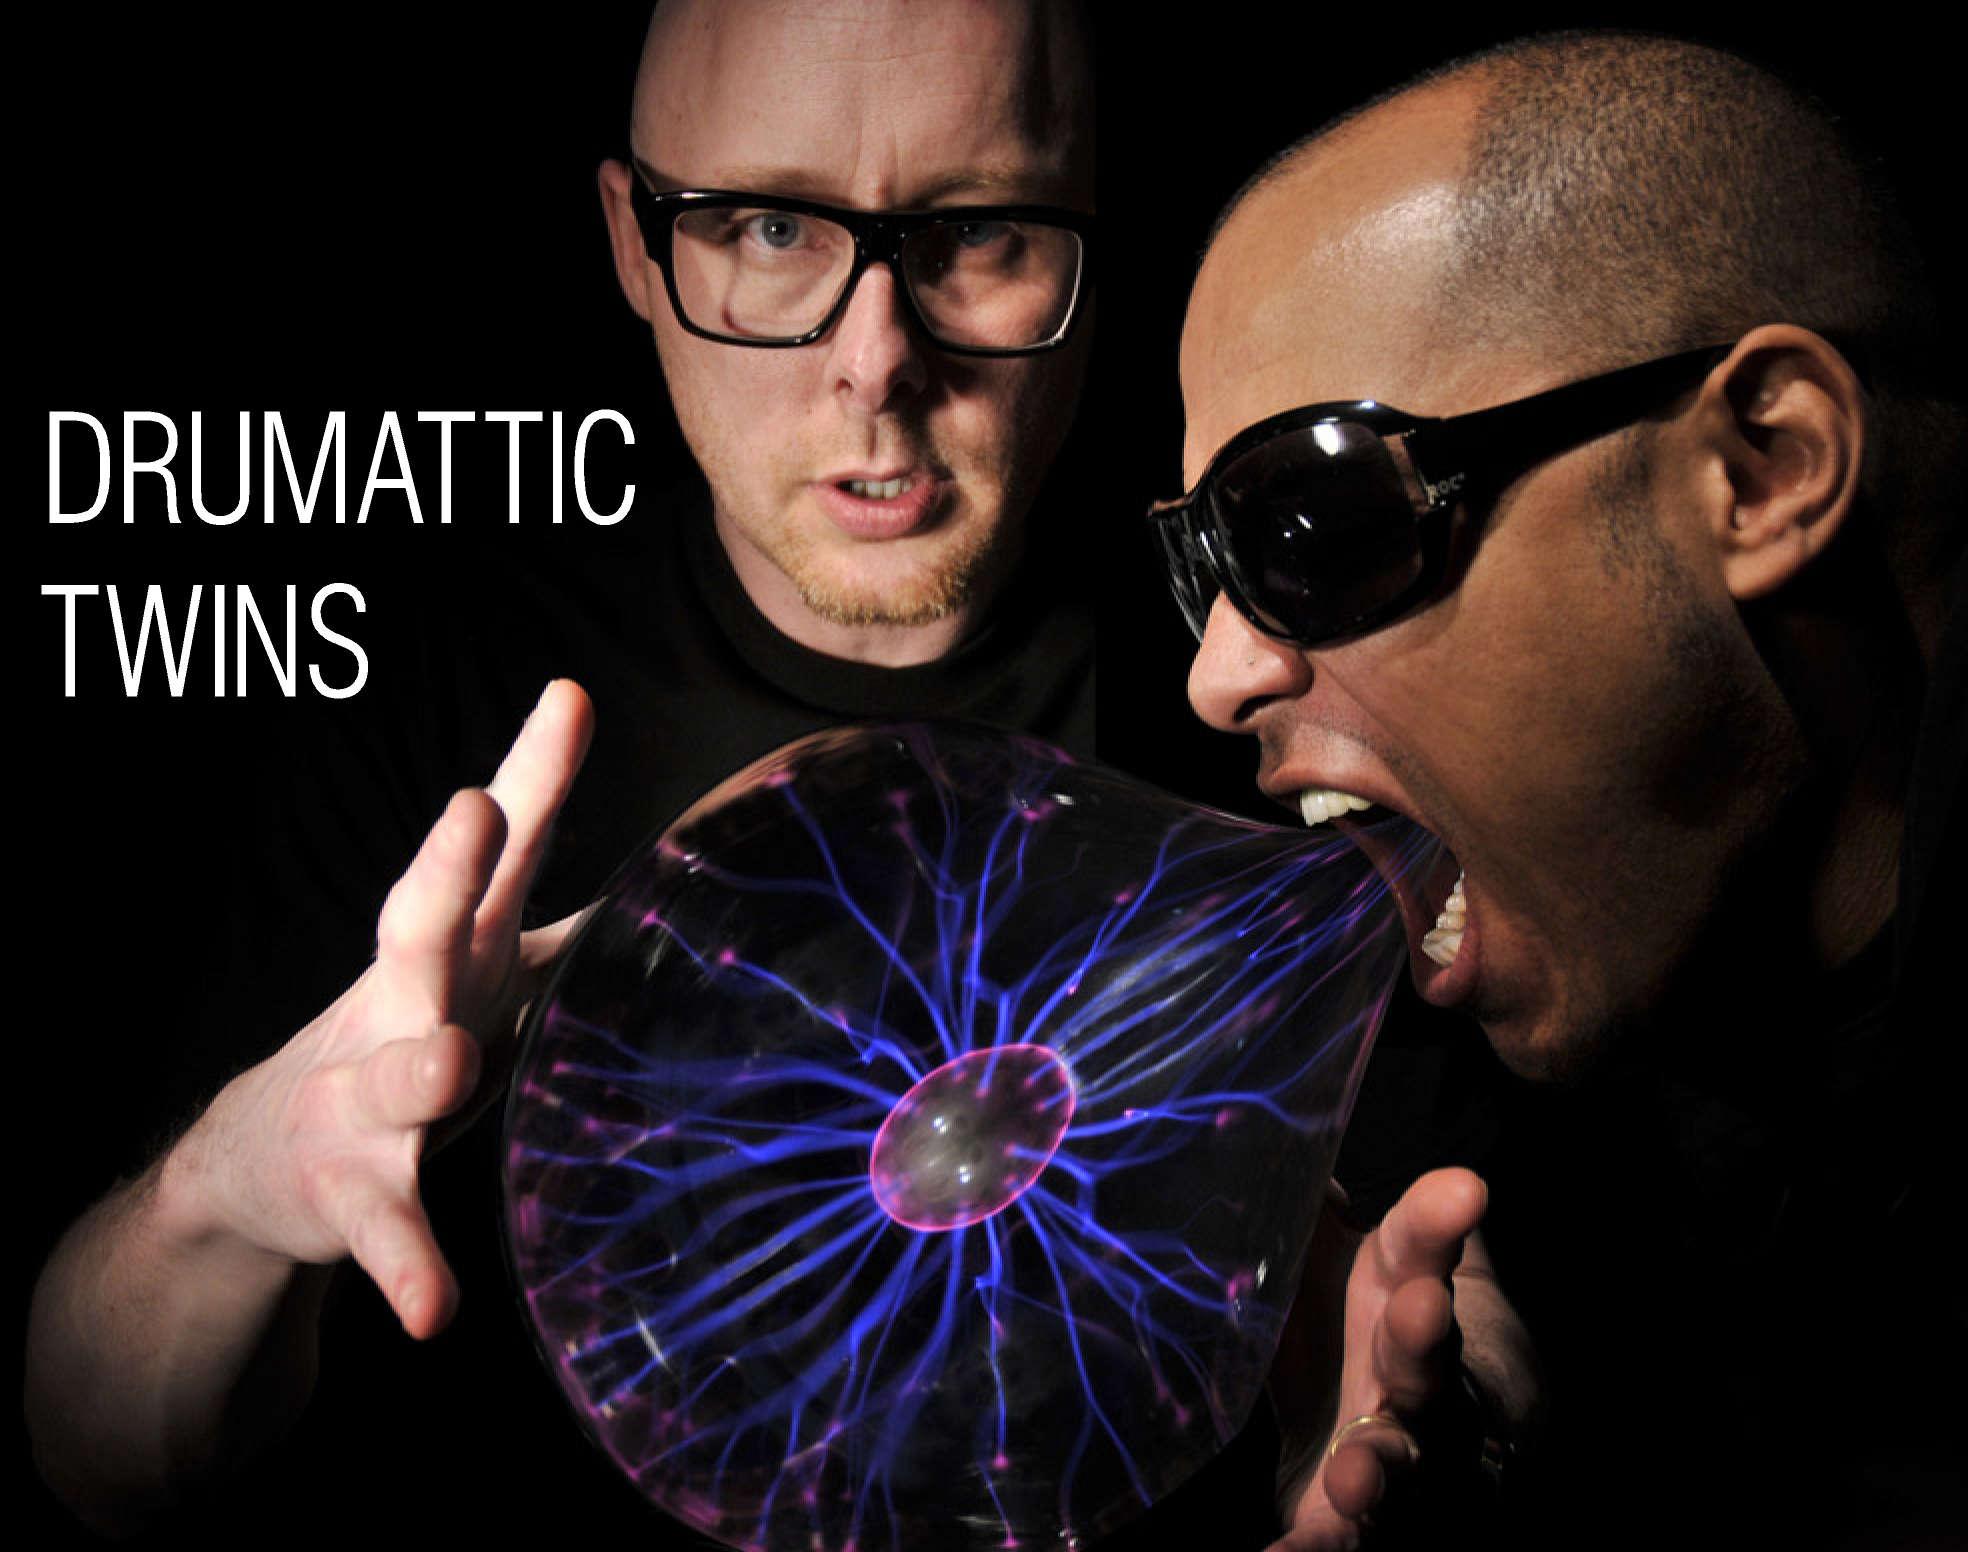 Drumattic Twins - Twister / Sticky